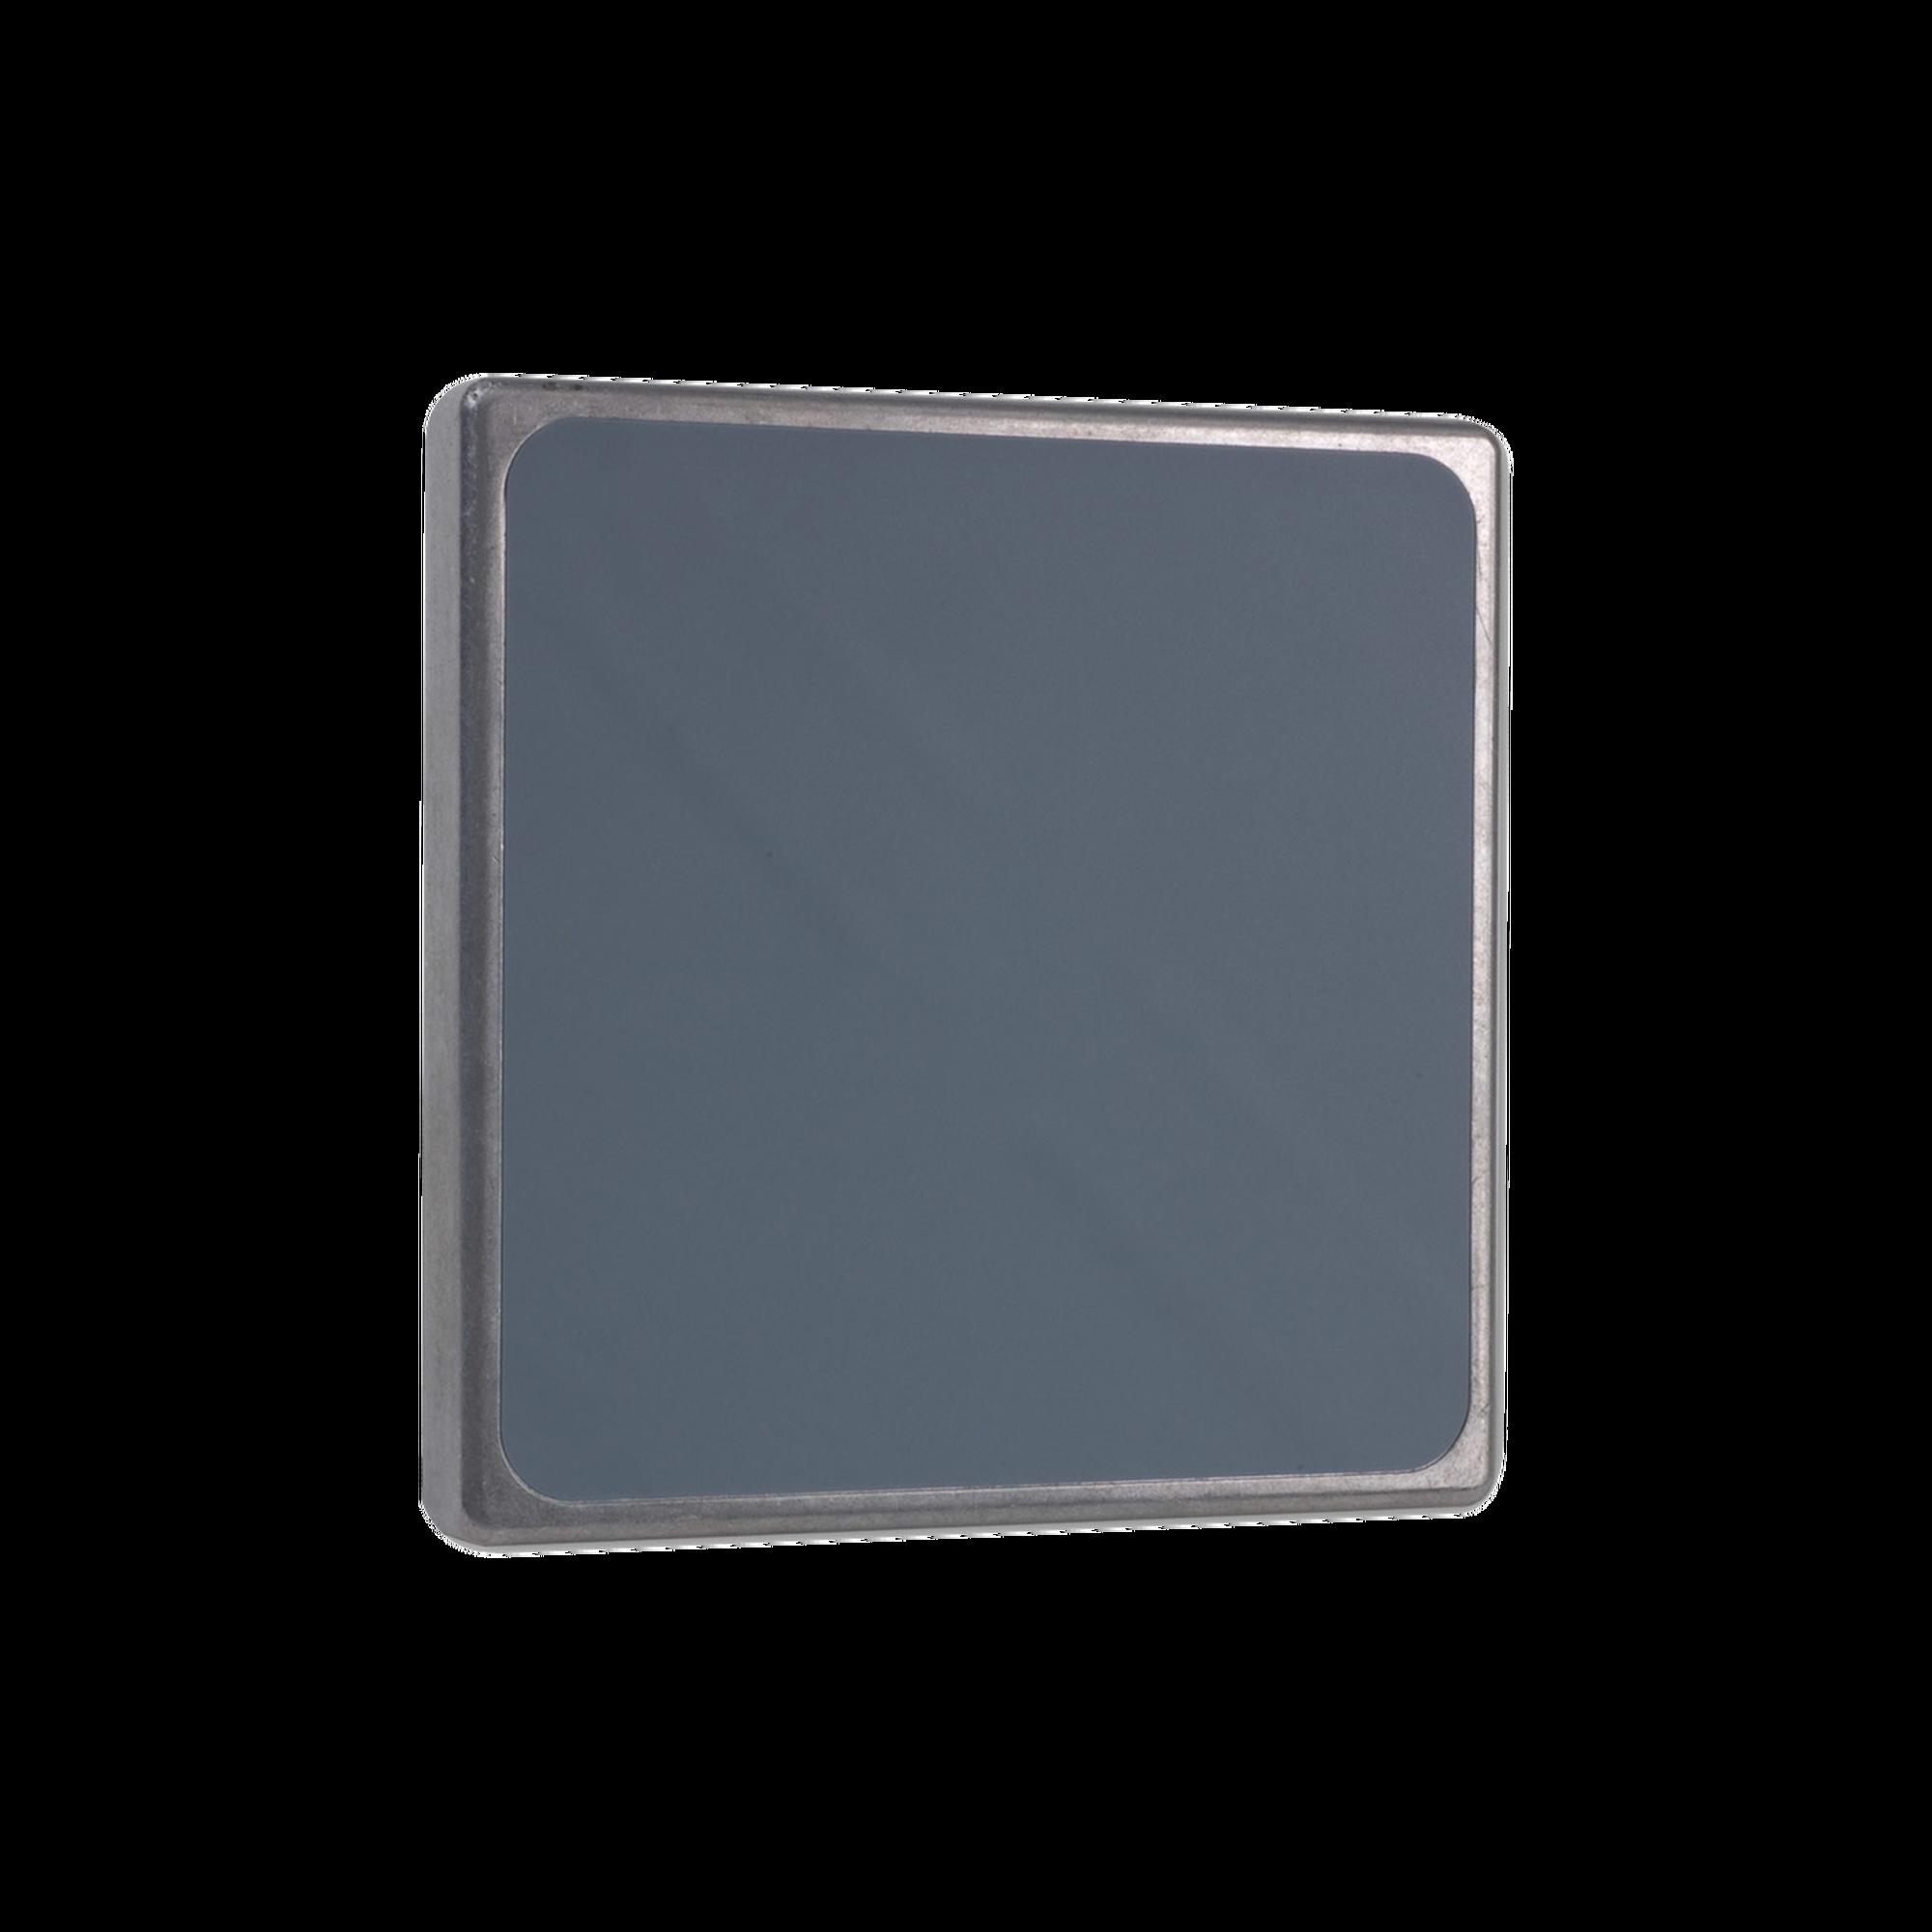 ANTENA RFID DE METAL, FREC. 902-928 MHz